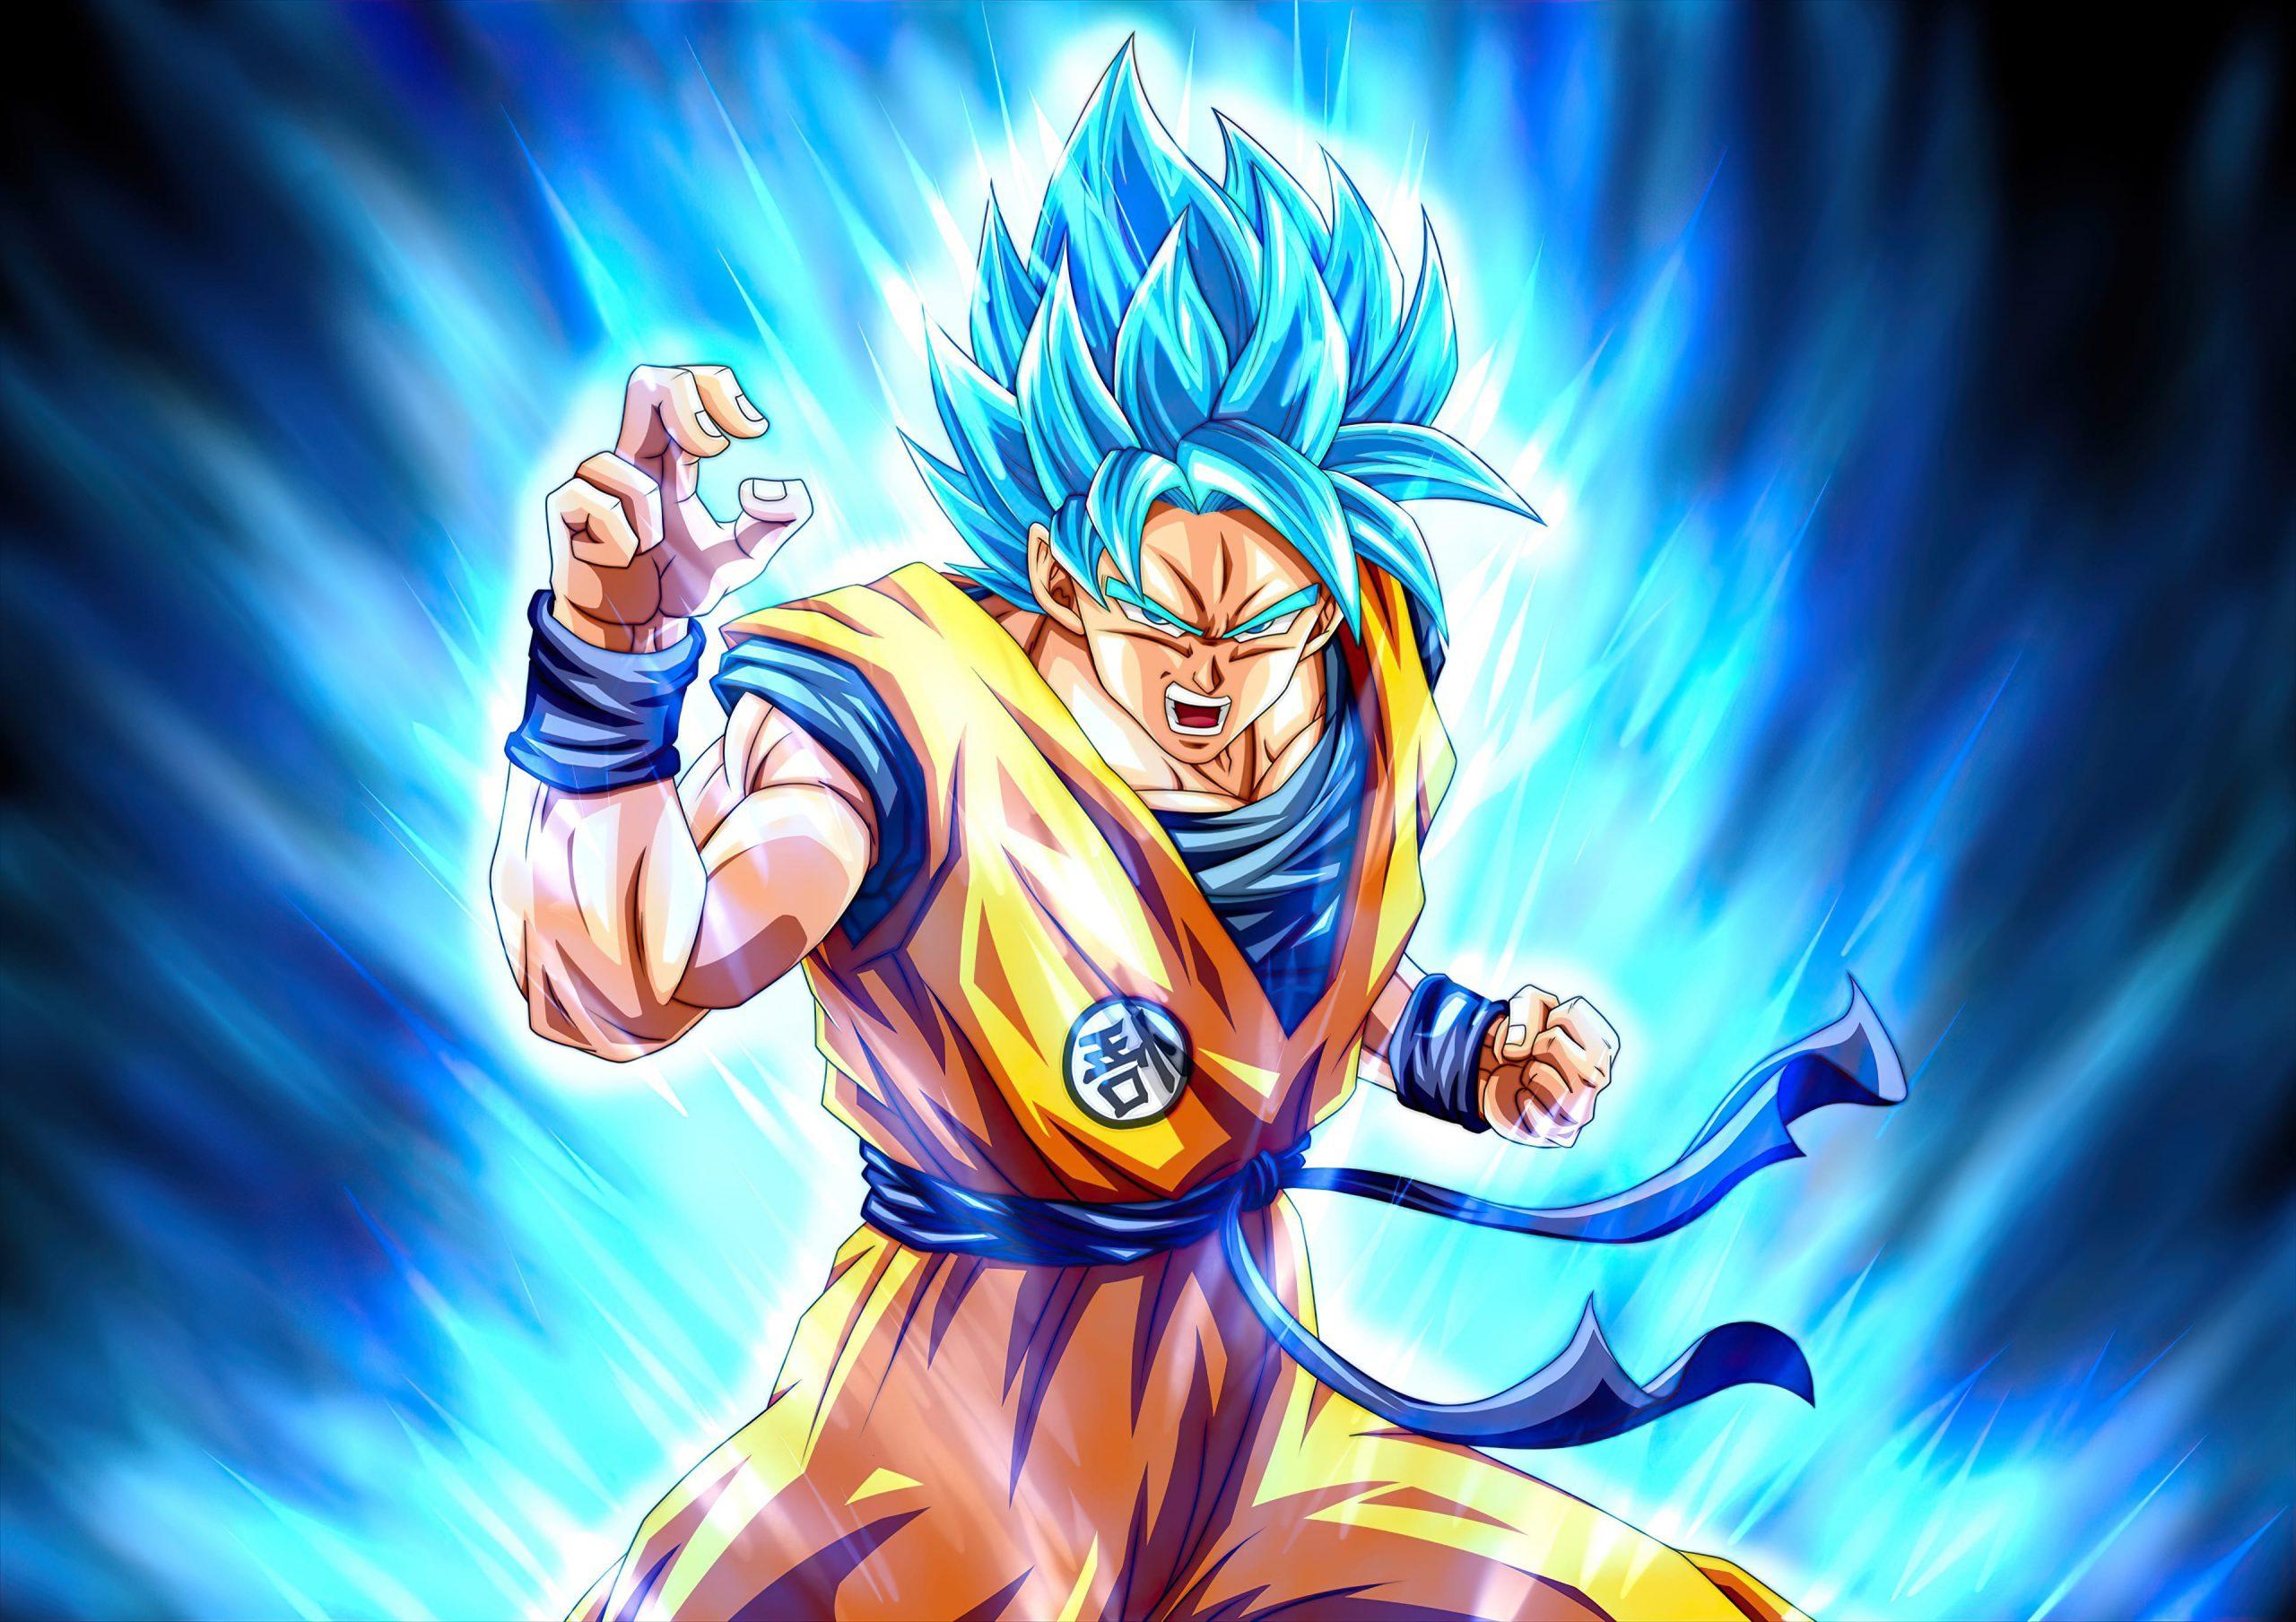 Goku 4k Wallpaper Enjpg